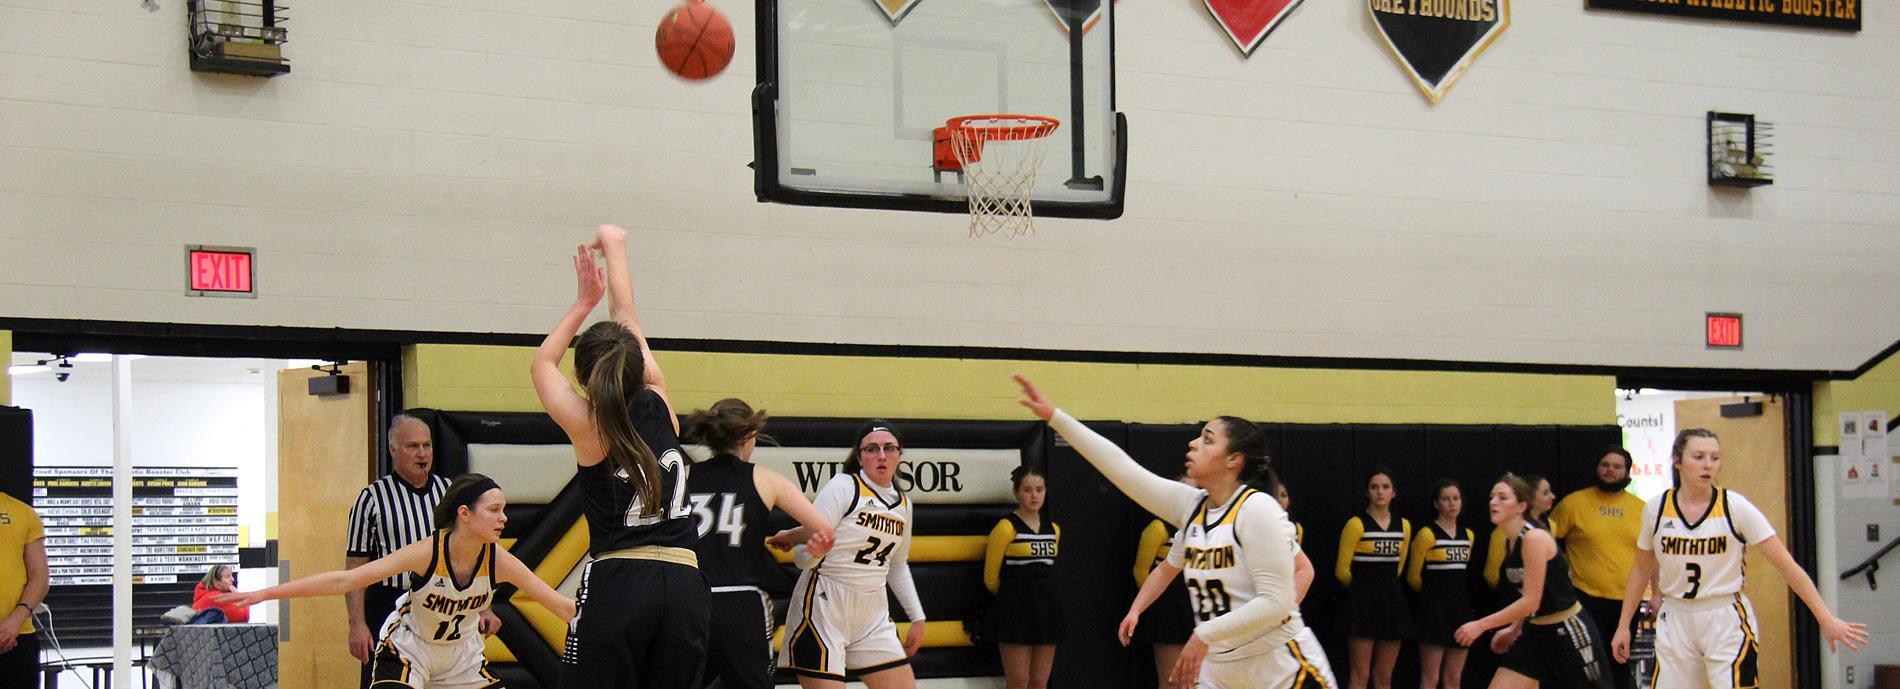 charlotte lloyd shooting basketball